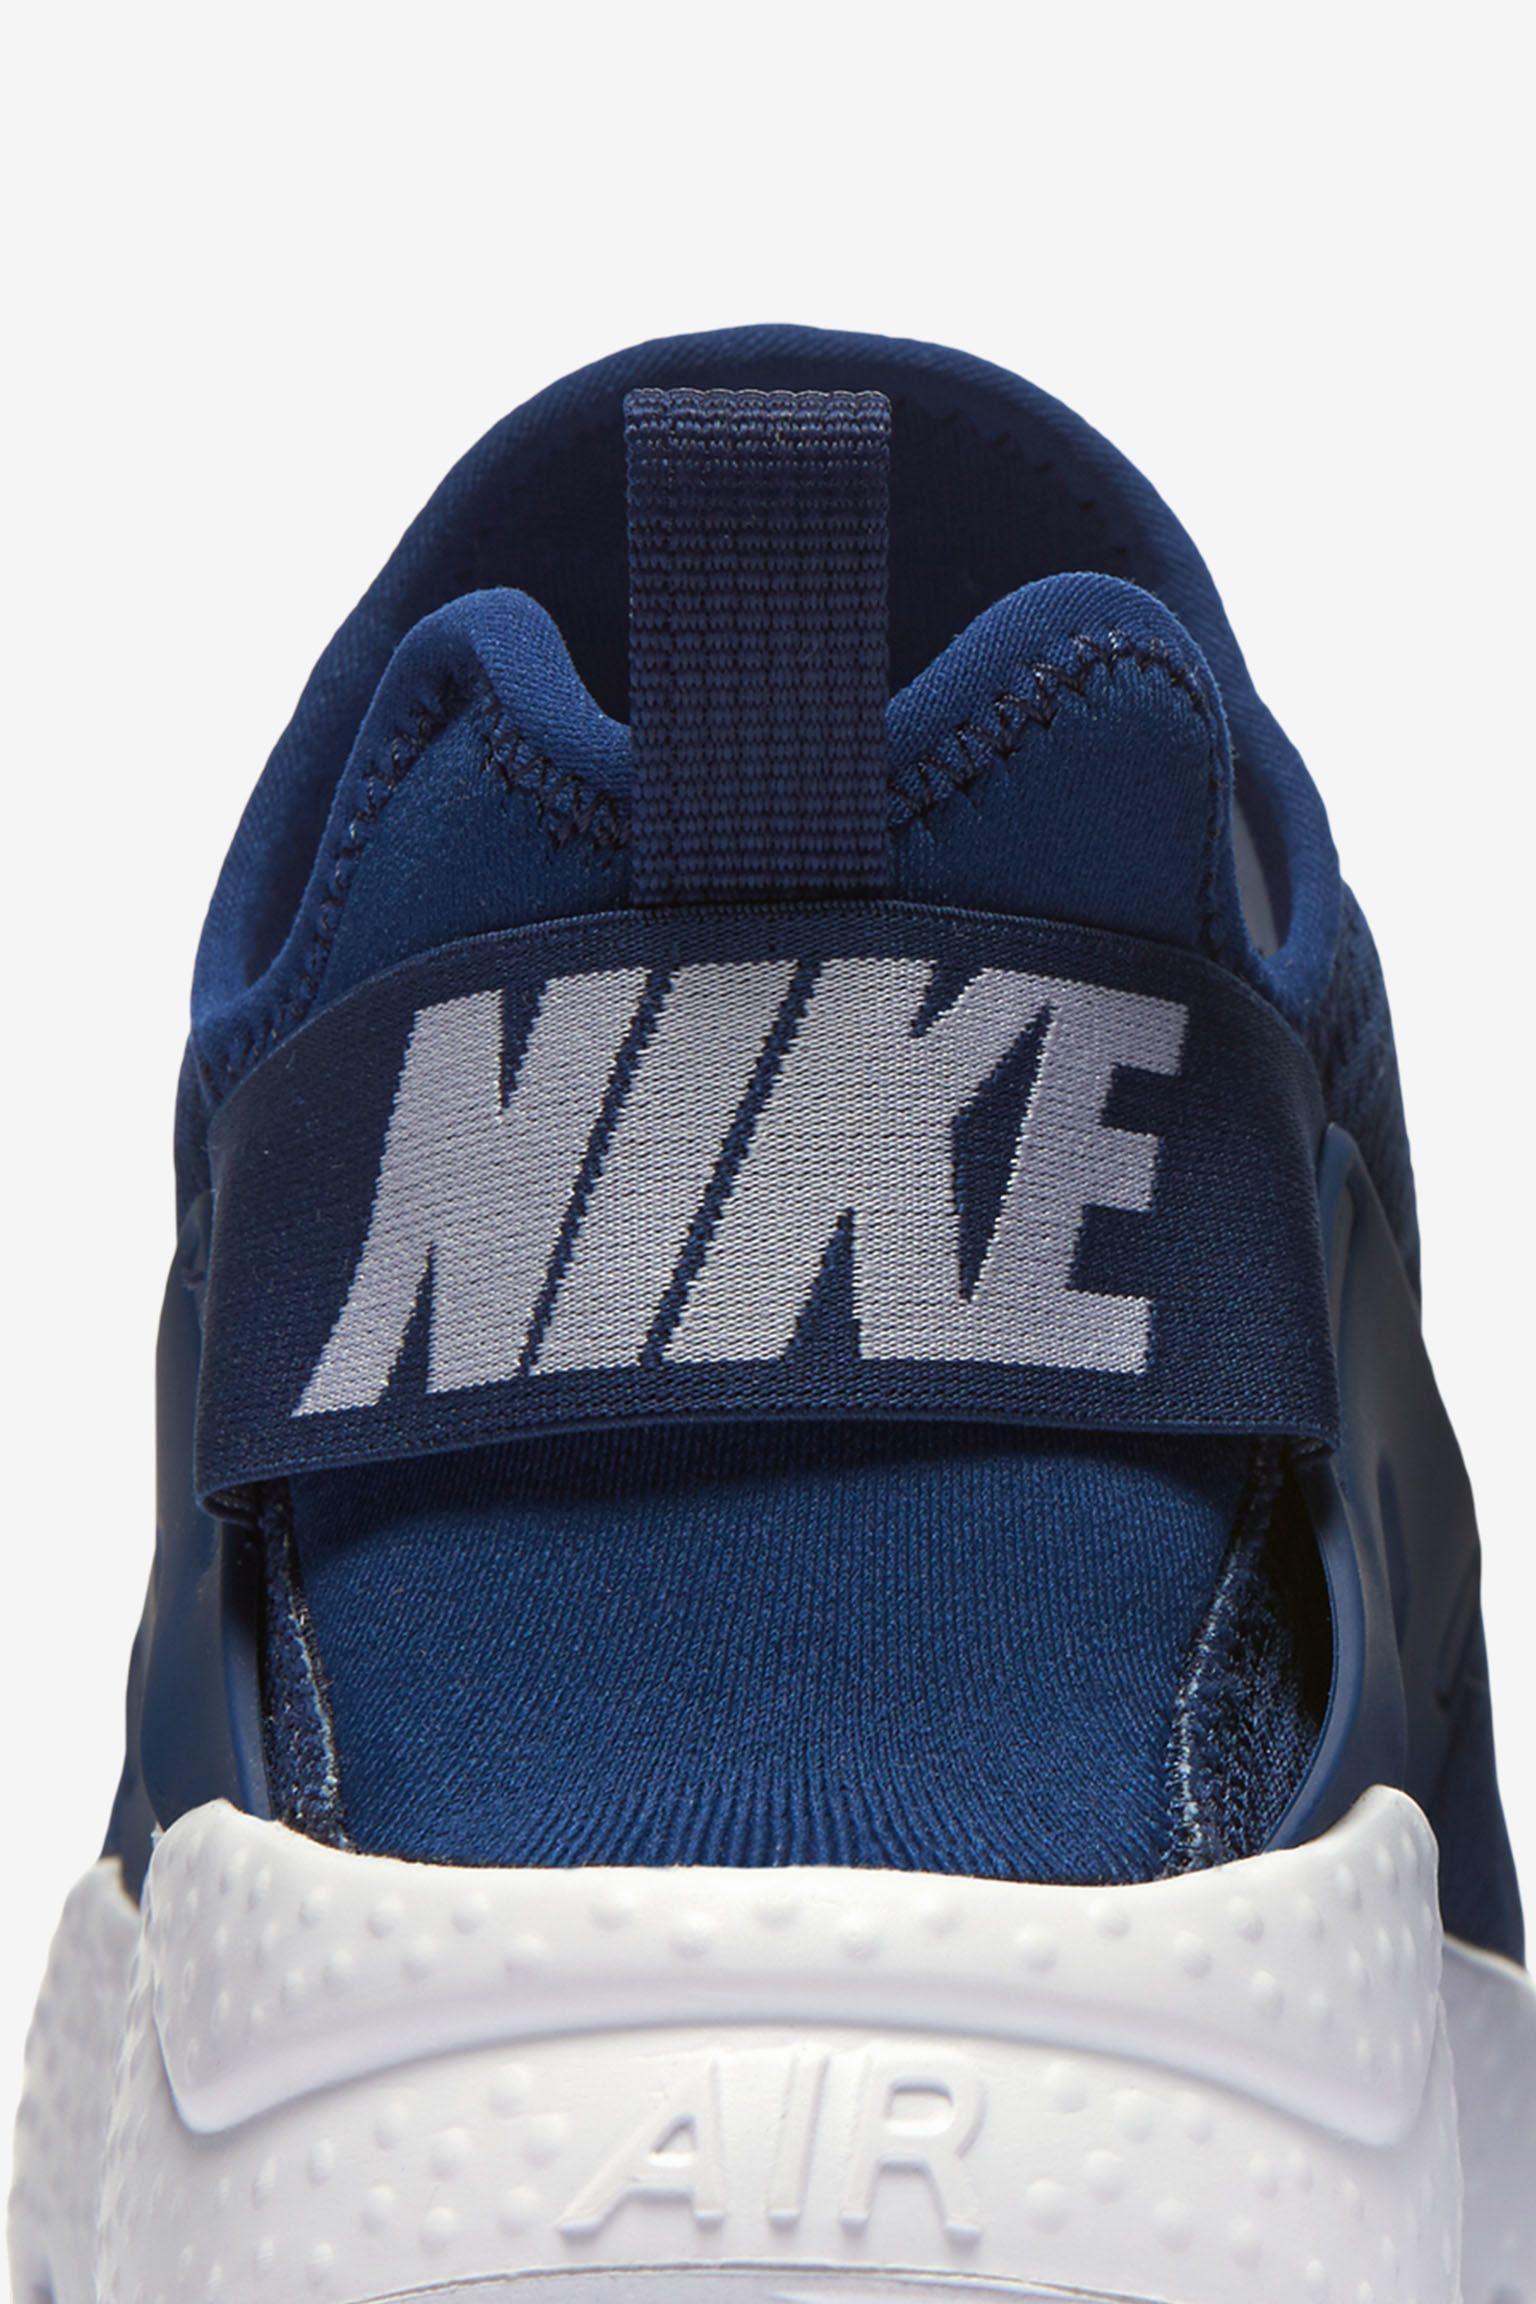 Women's Nike Air Huarache Ultra 'Coastal Blue'